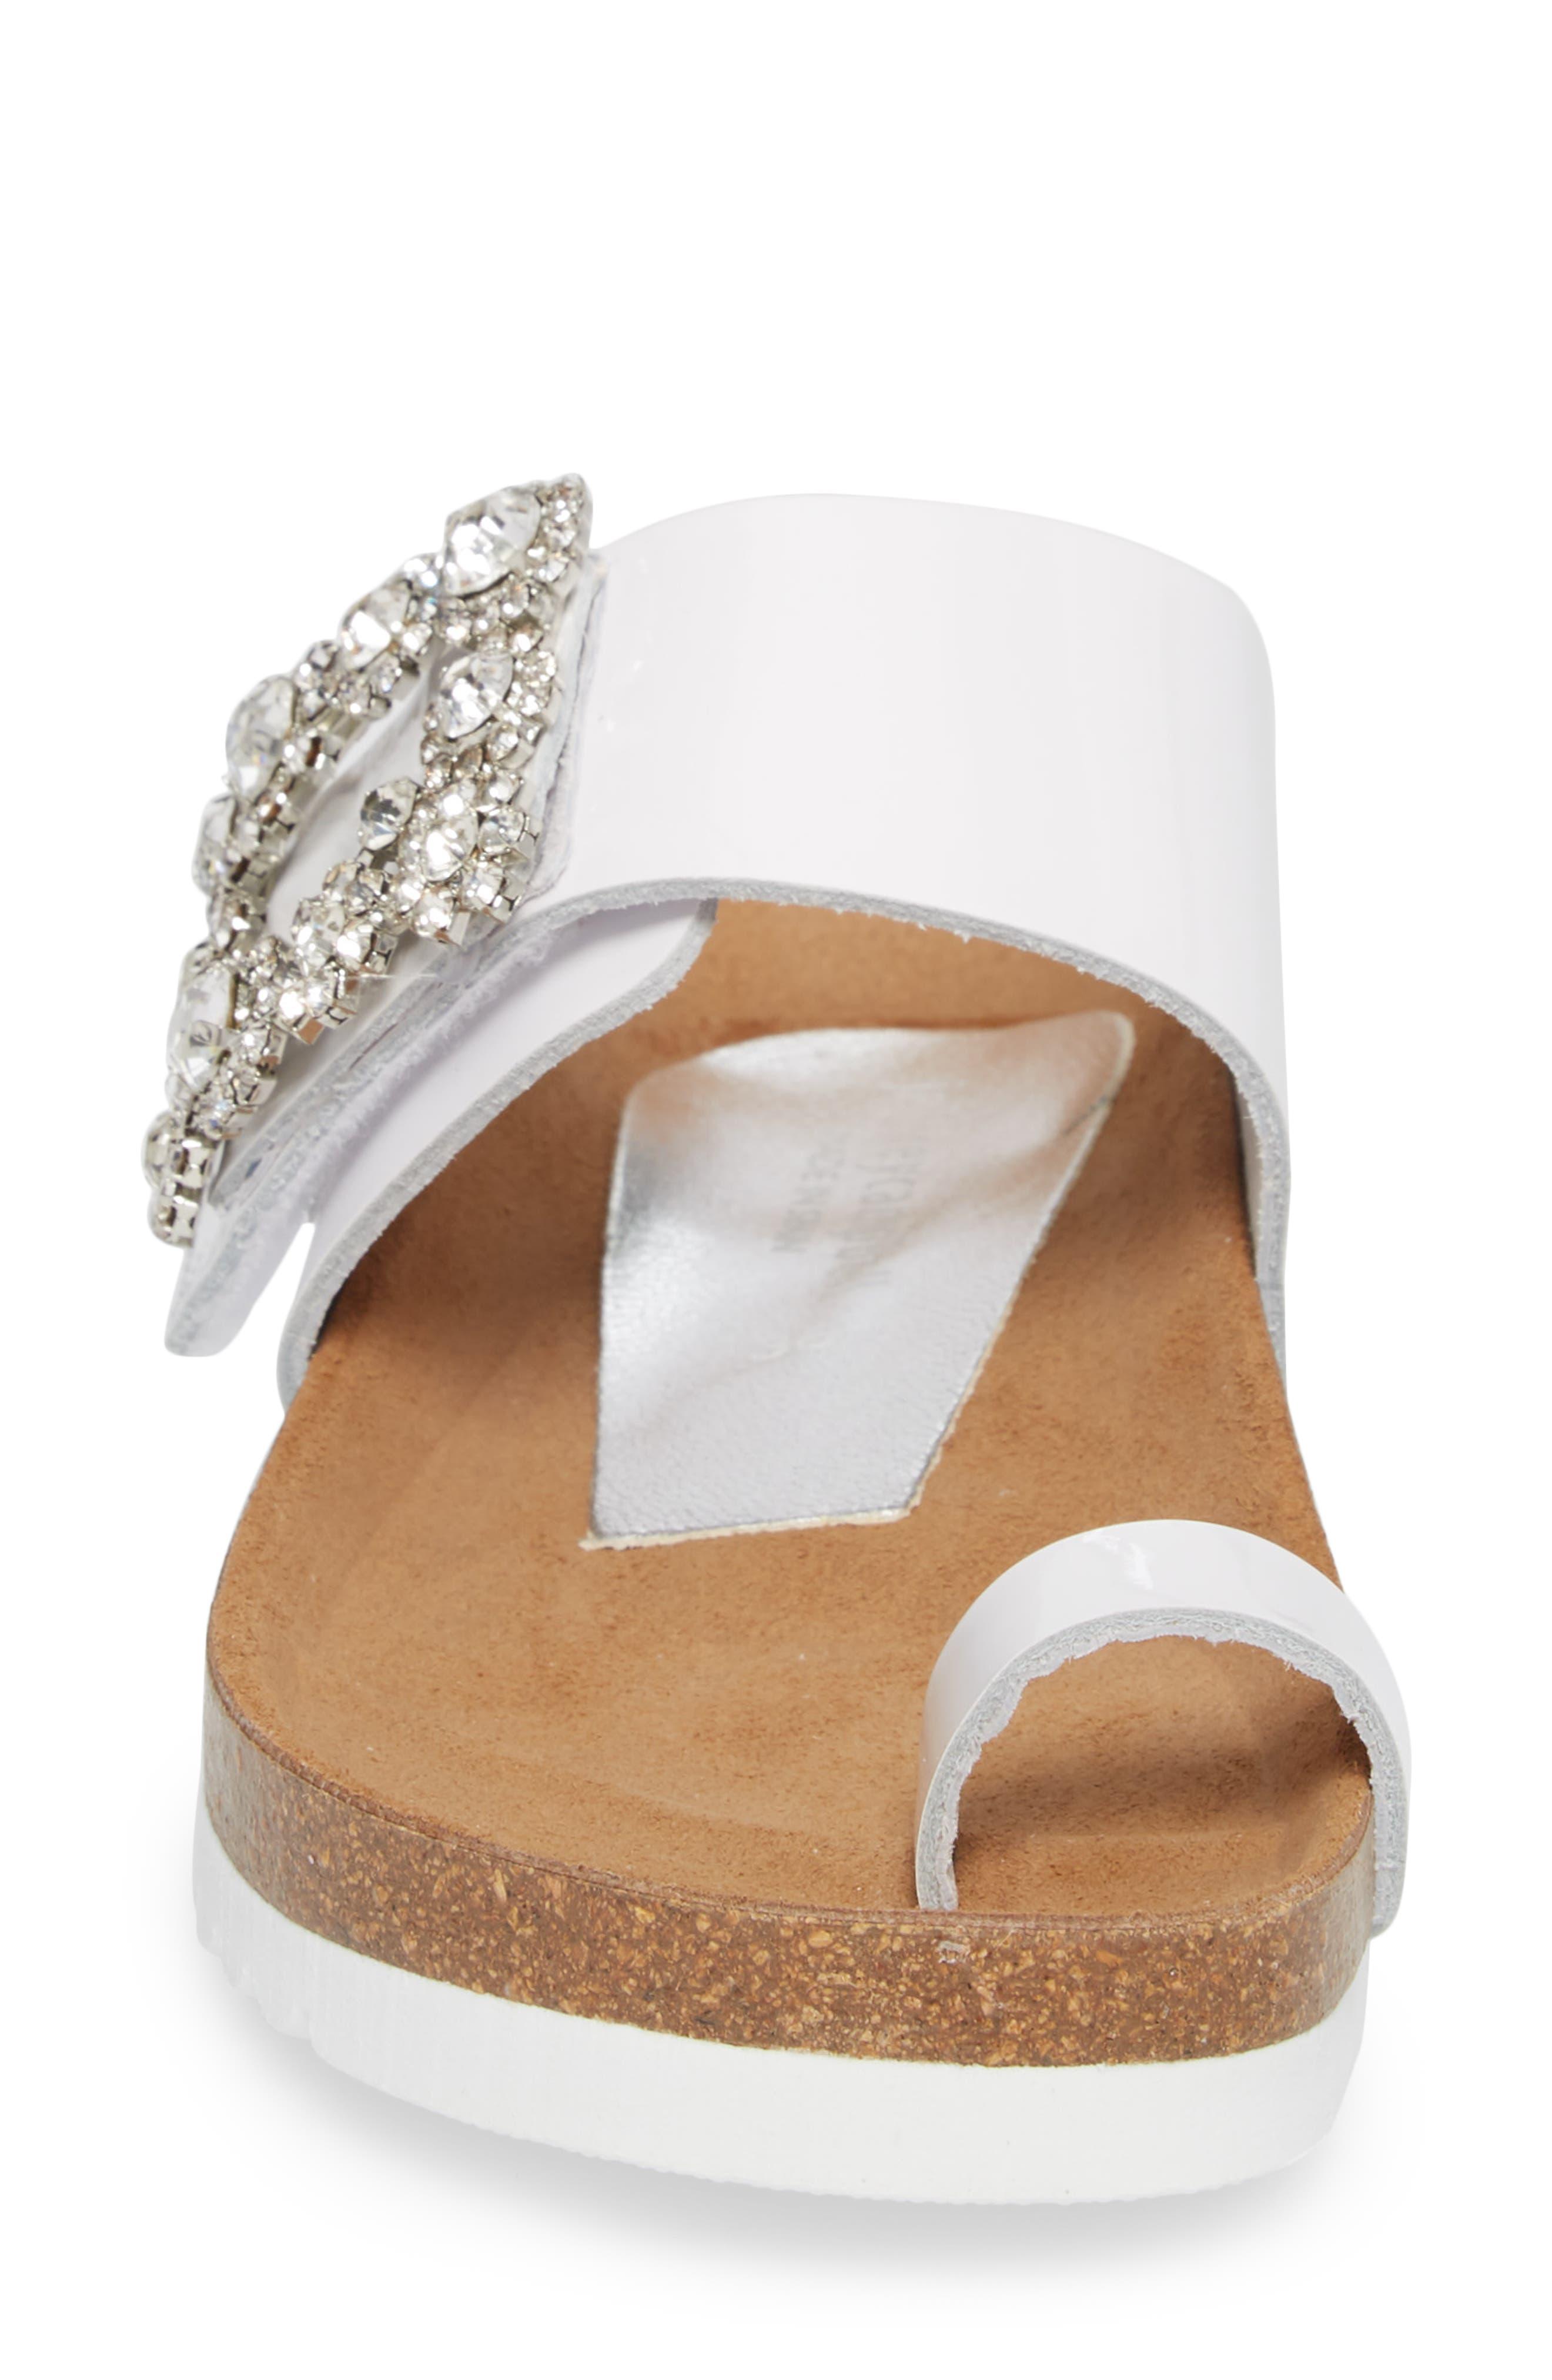 Bianca Embellished Slide Sandal,                             Alternate thumbnail 4, color,                             White Patent/ Silver